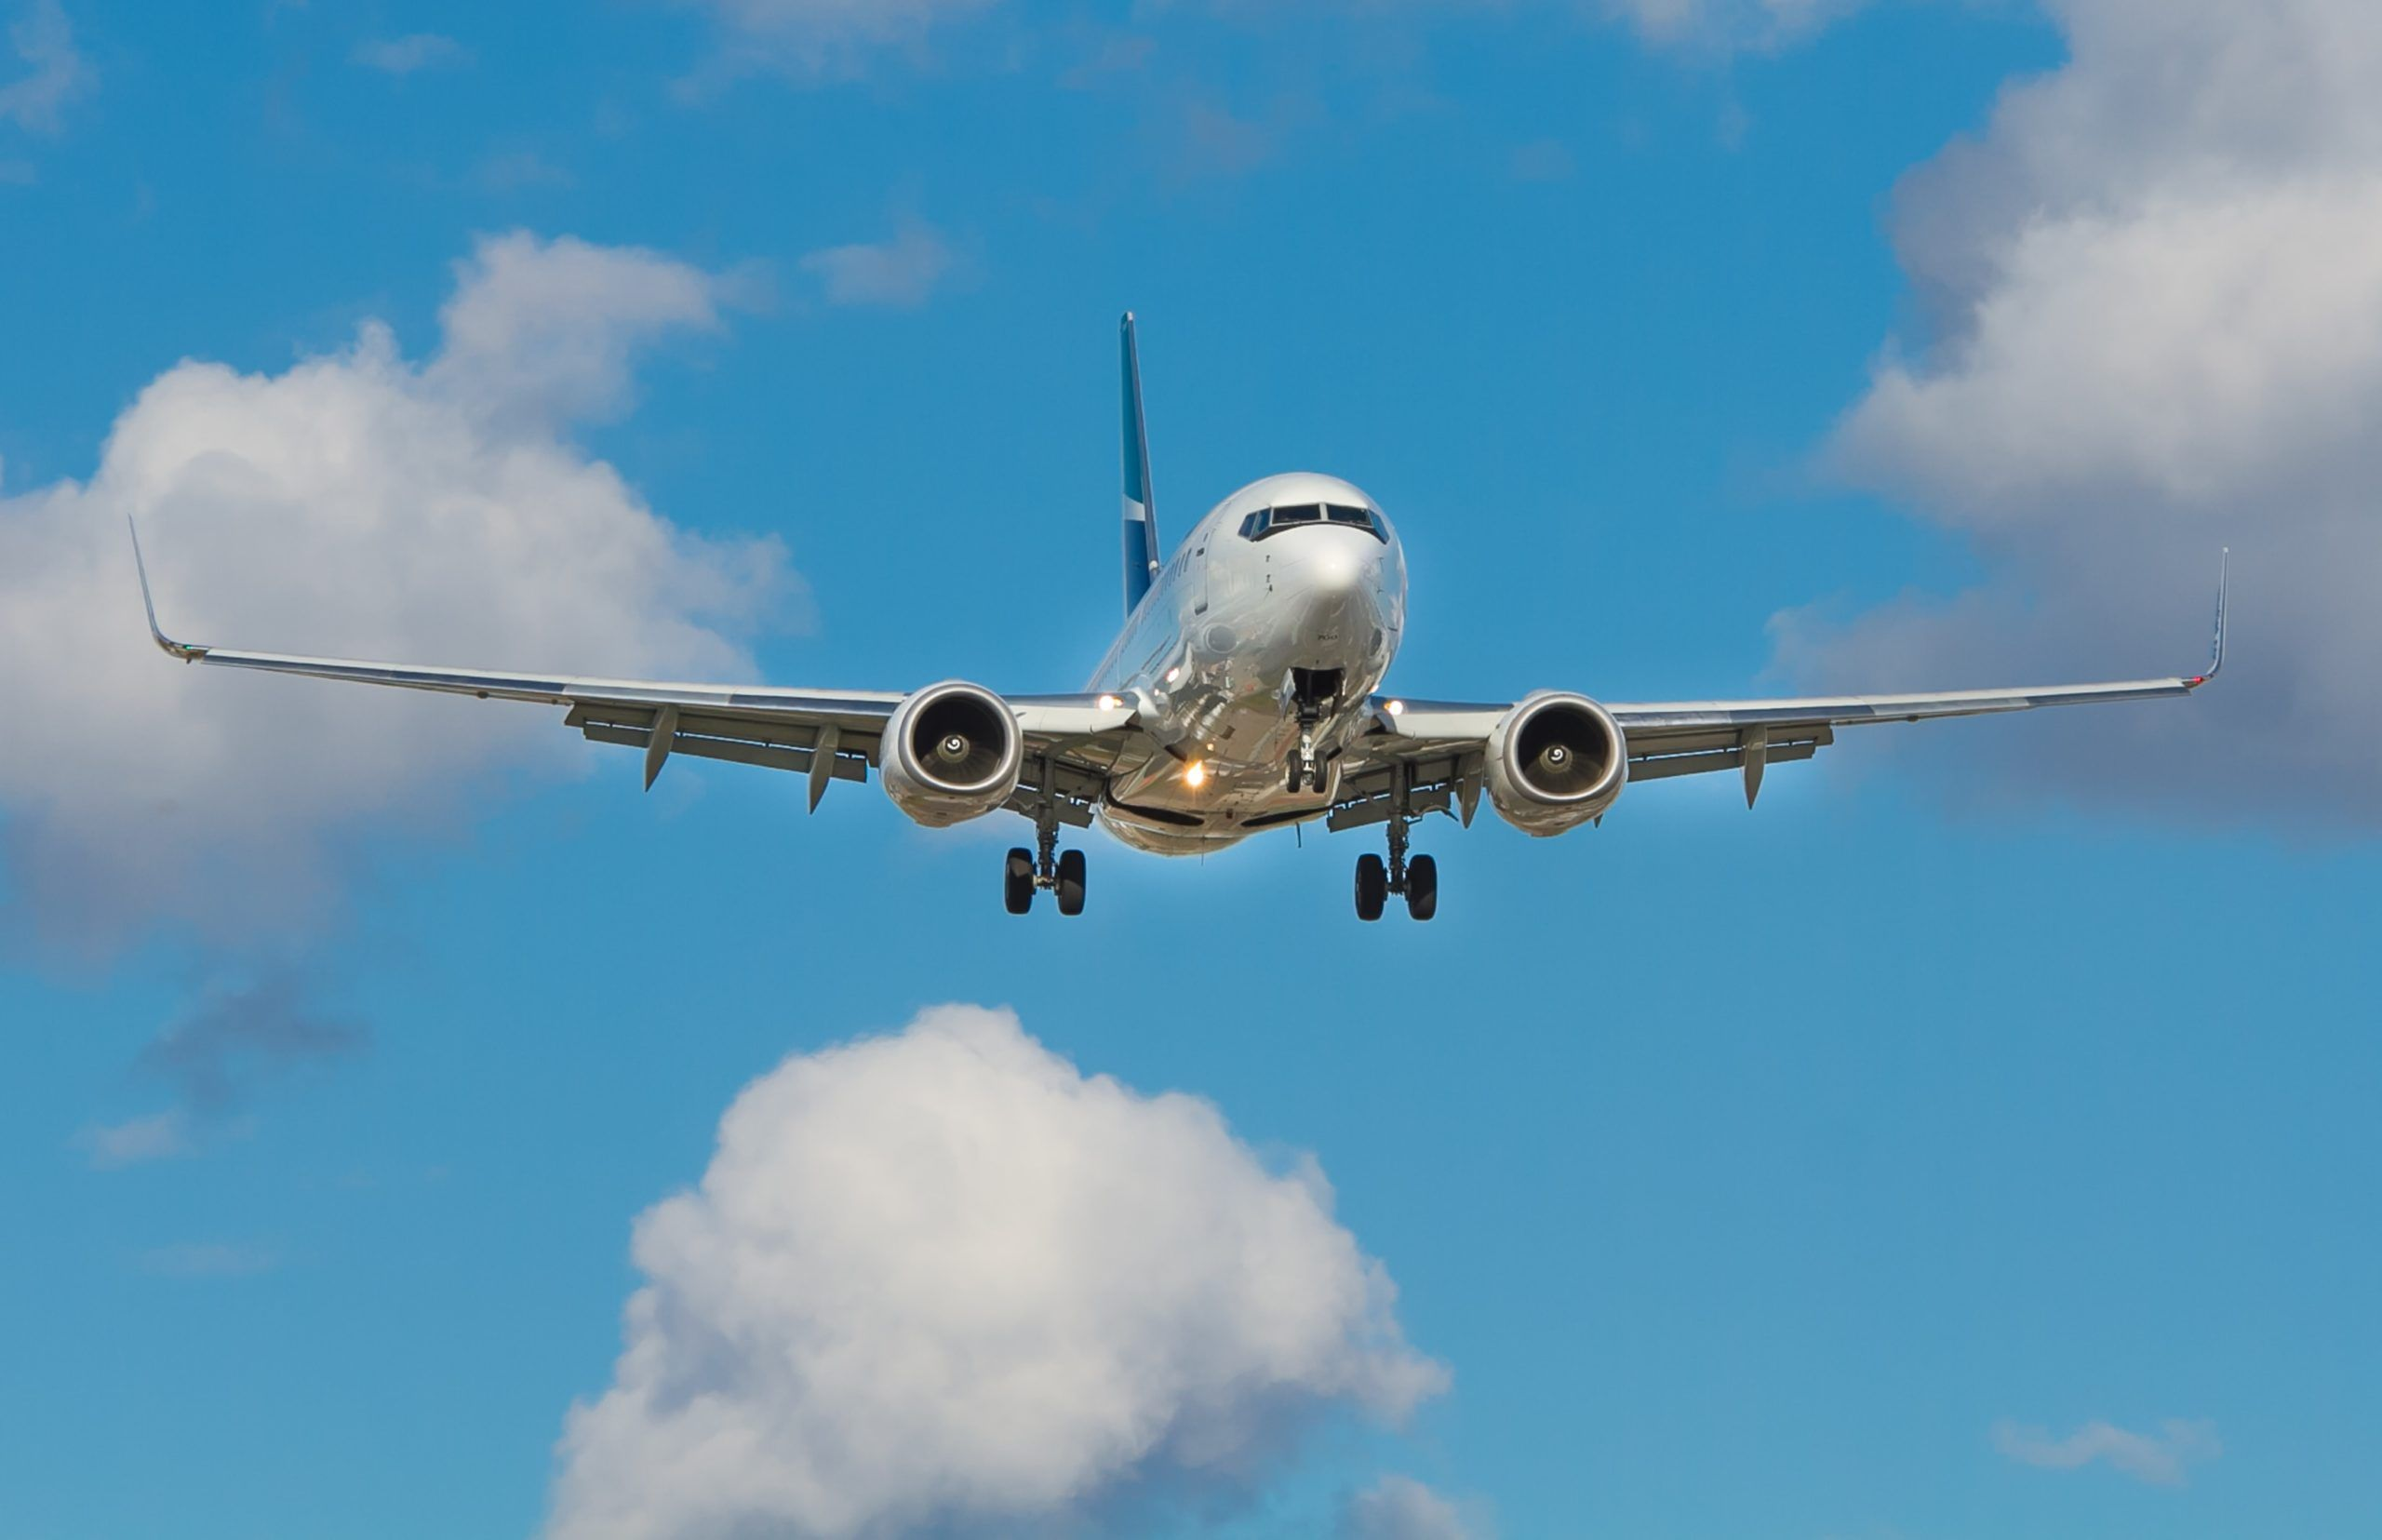 white airplane on mid air